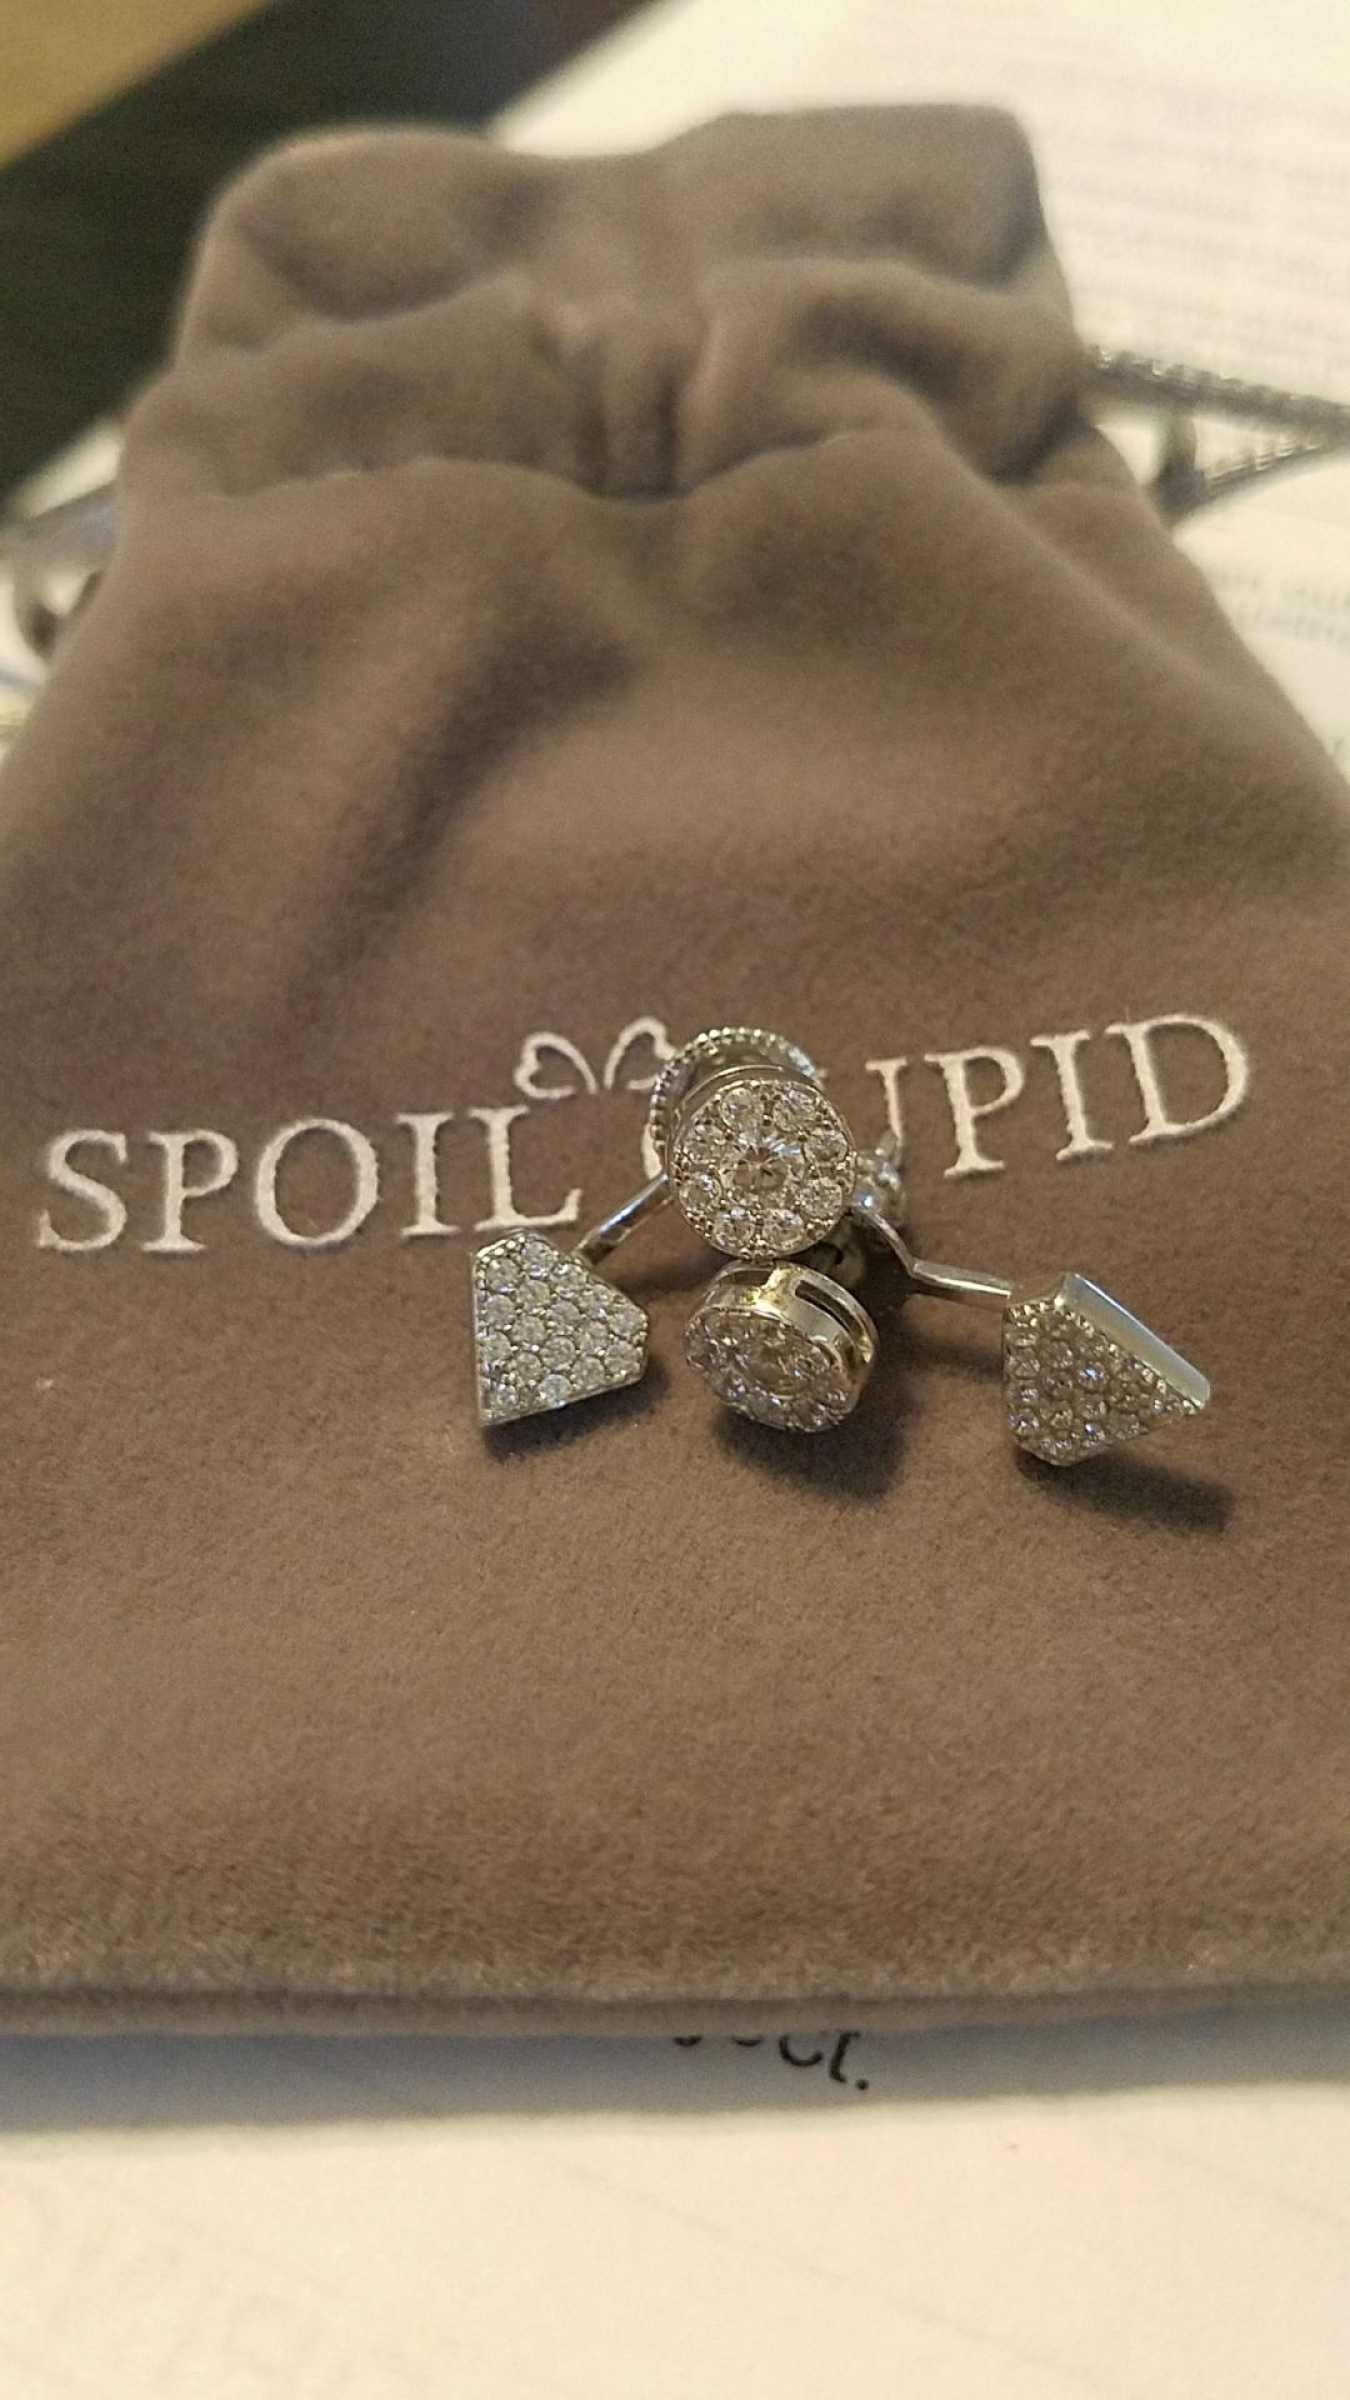 my new favorite earrings!!